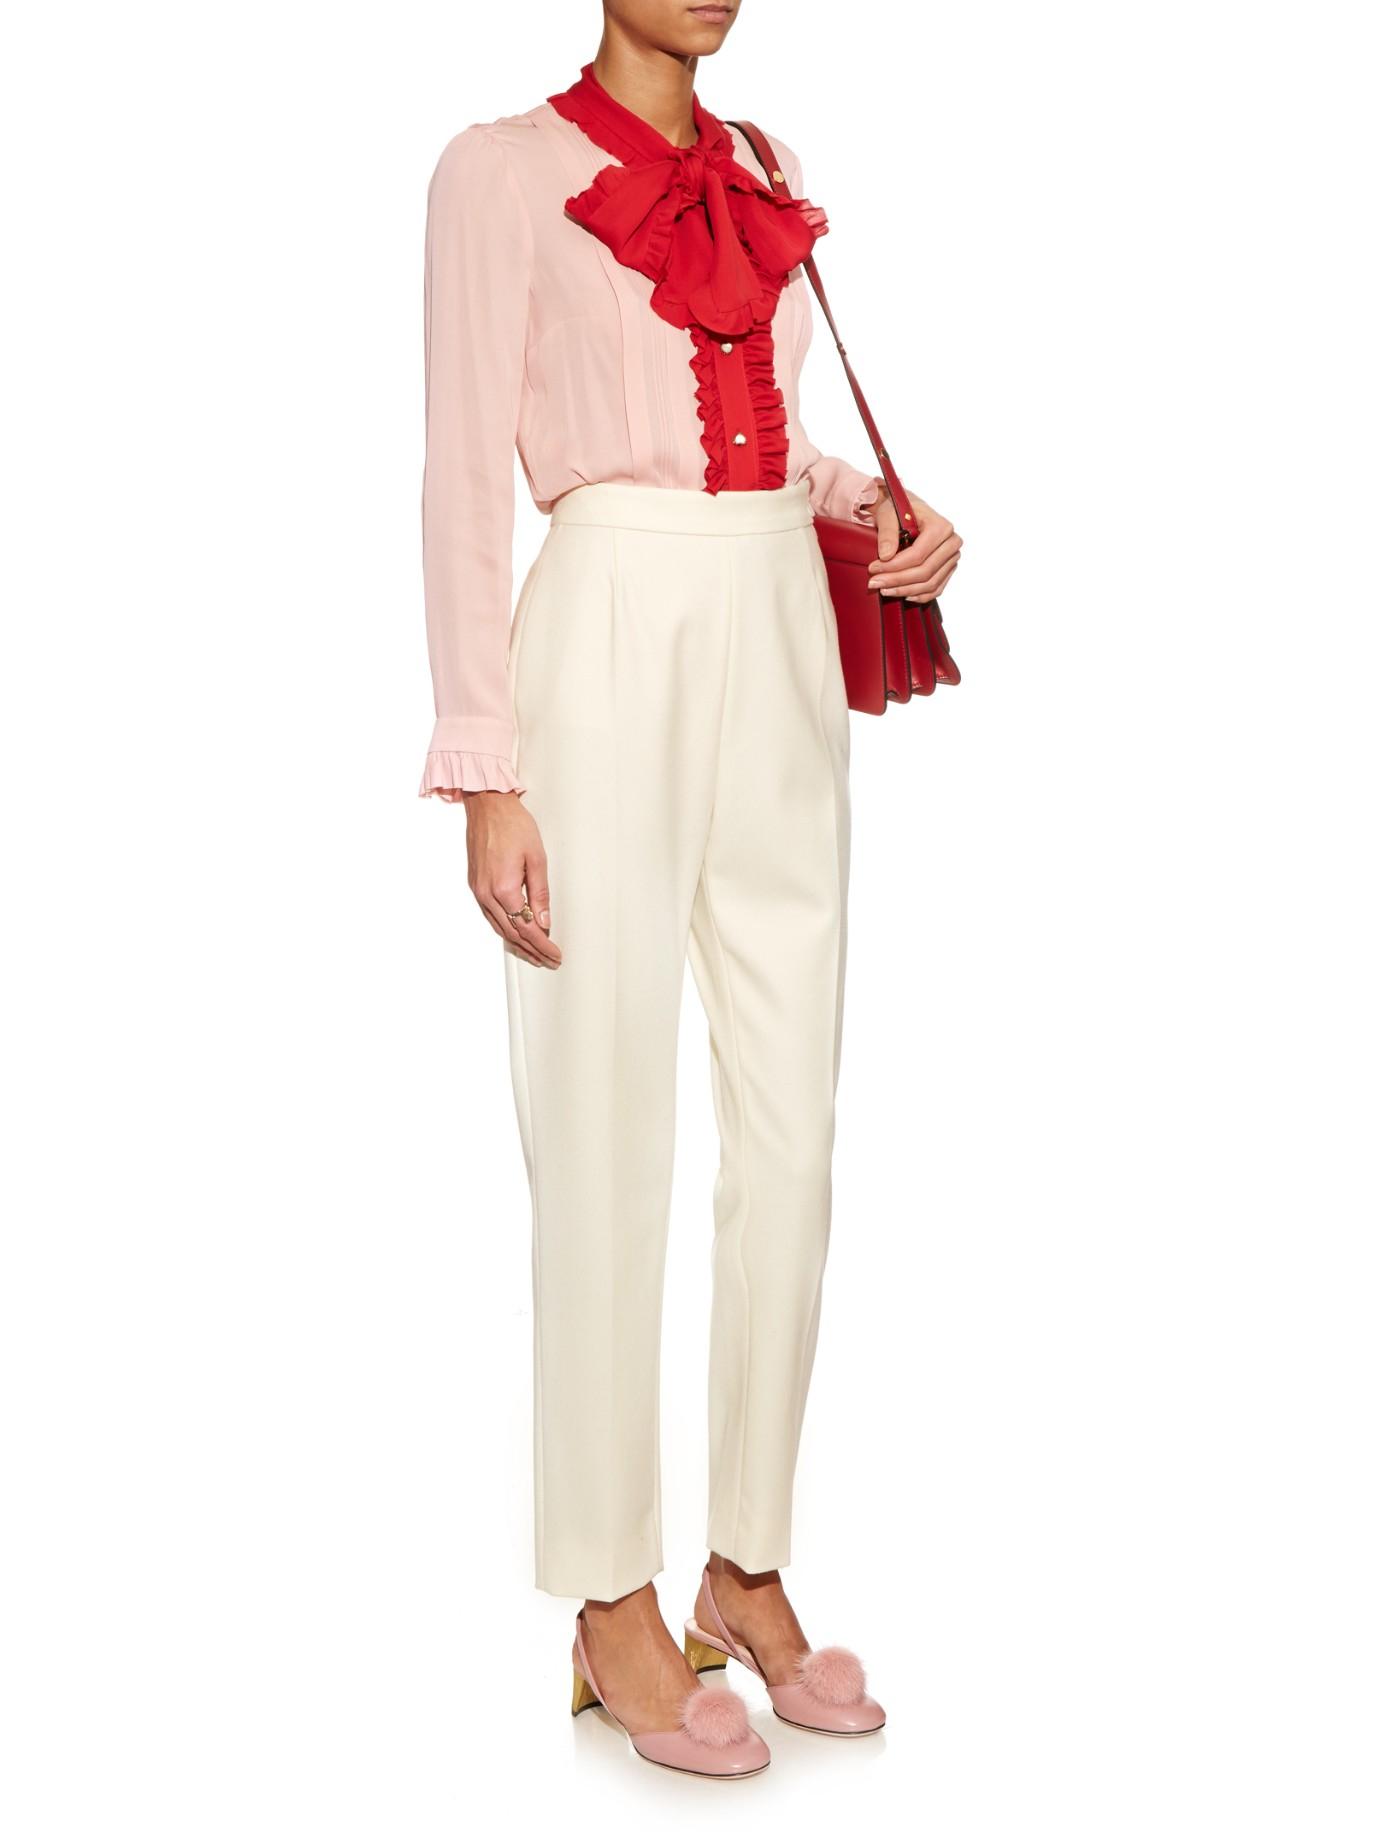 Lyst - Gucci Pompom Mink Fur Pumps in Pink